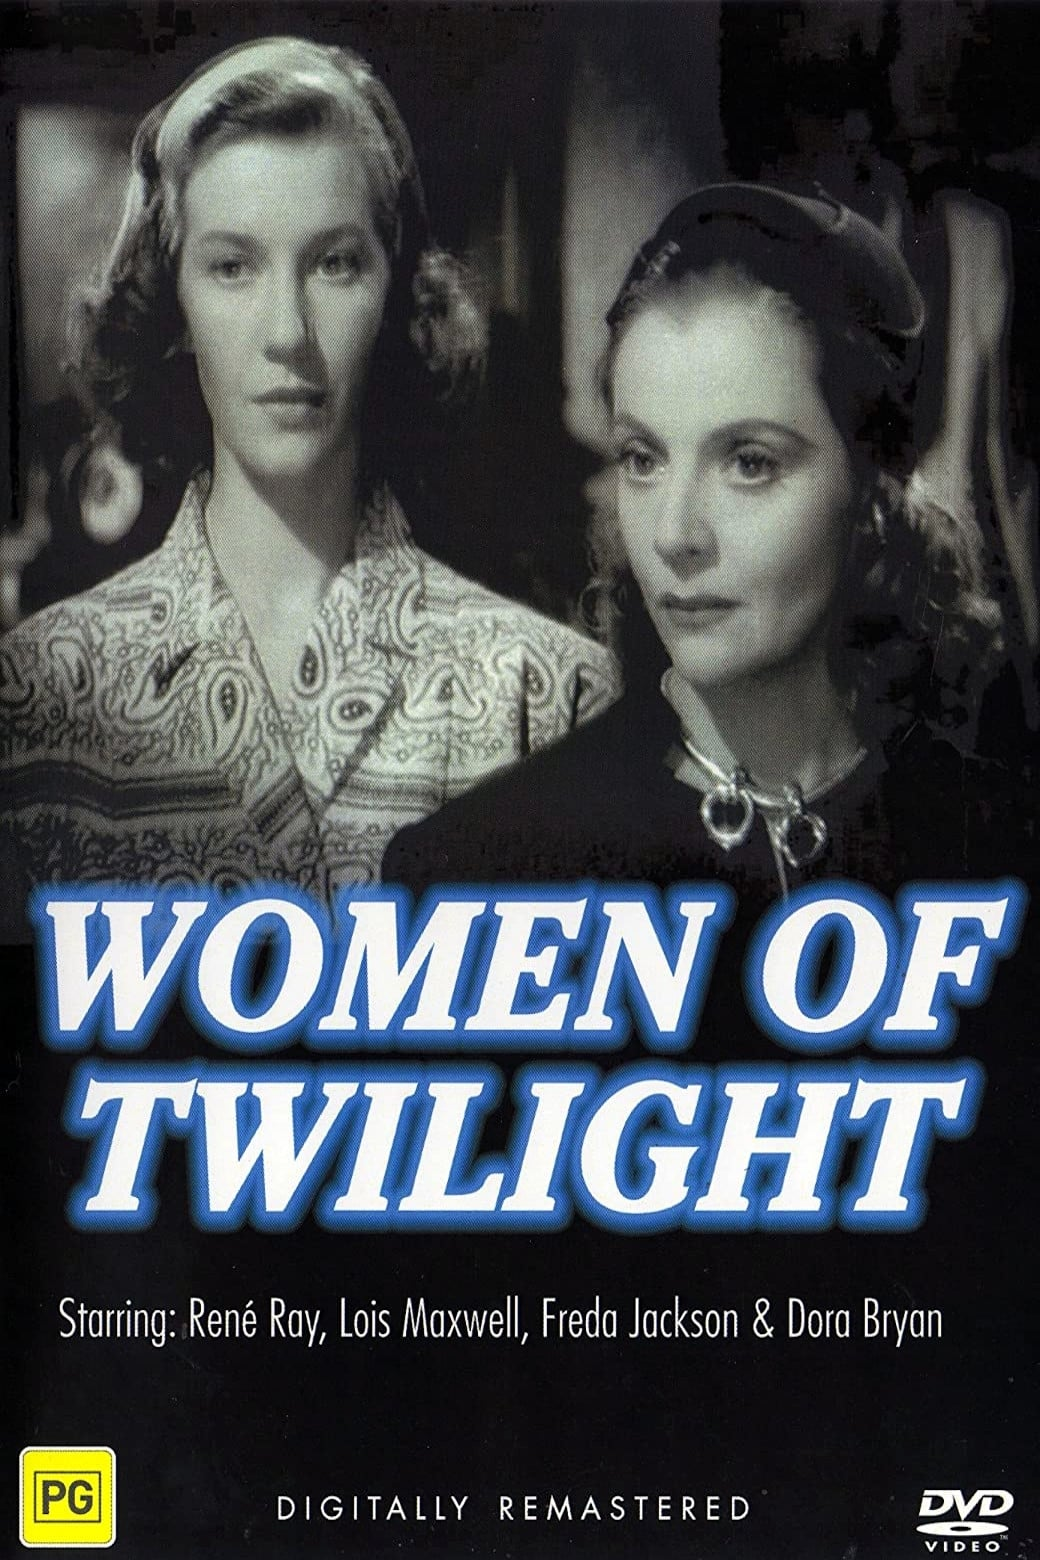 Women of Twilight (1952)